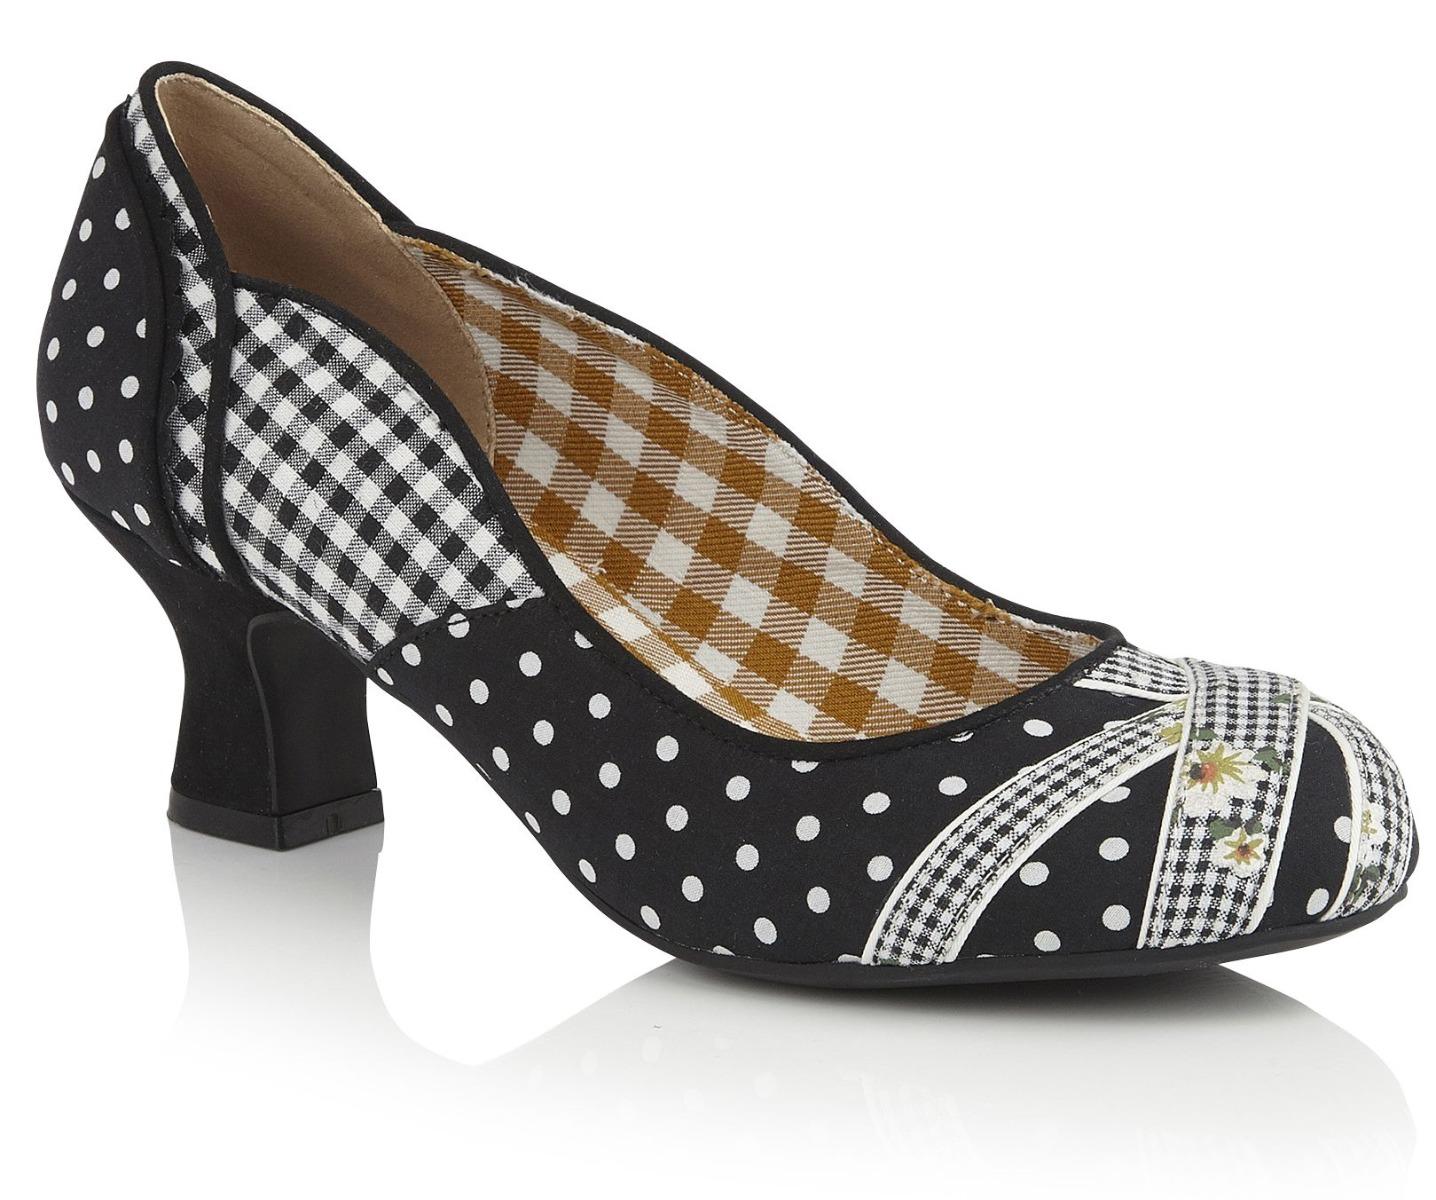 rs09278bb_chaussures-escarpins-pin-up-retro-50-s-glam-chic-paula-noir